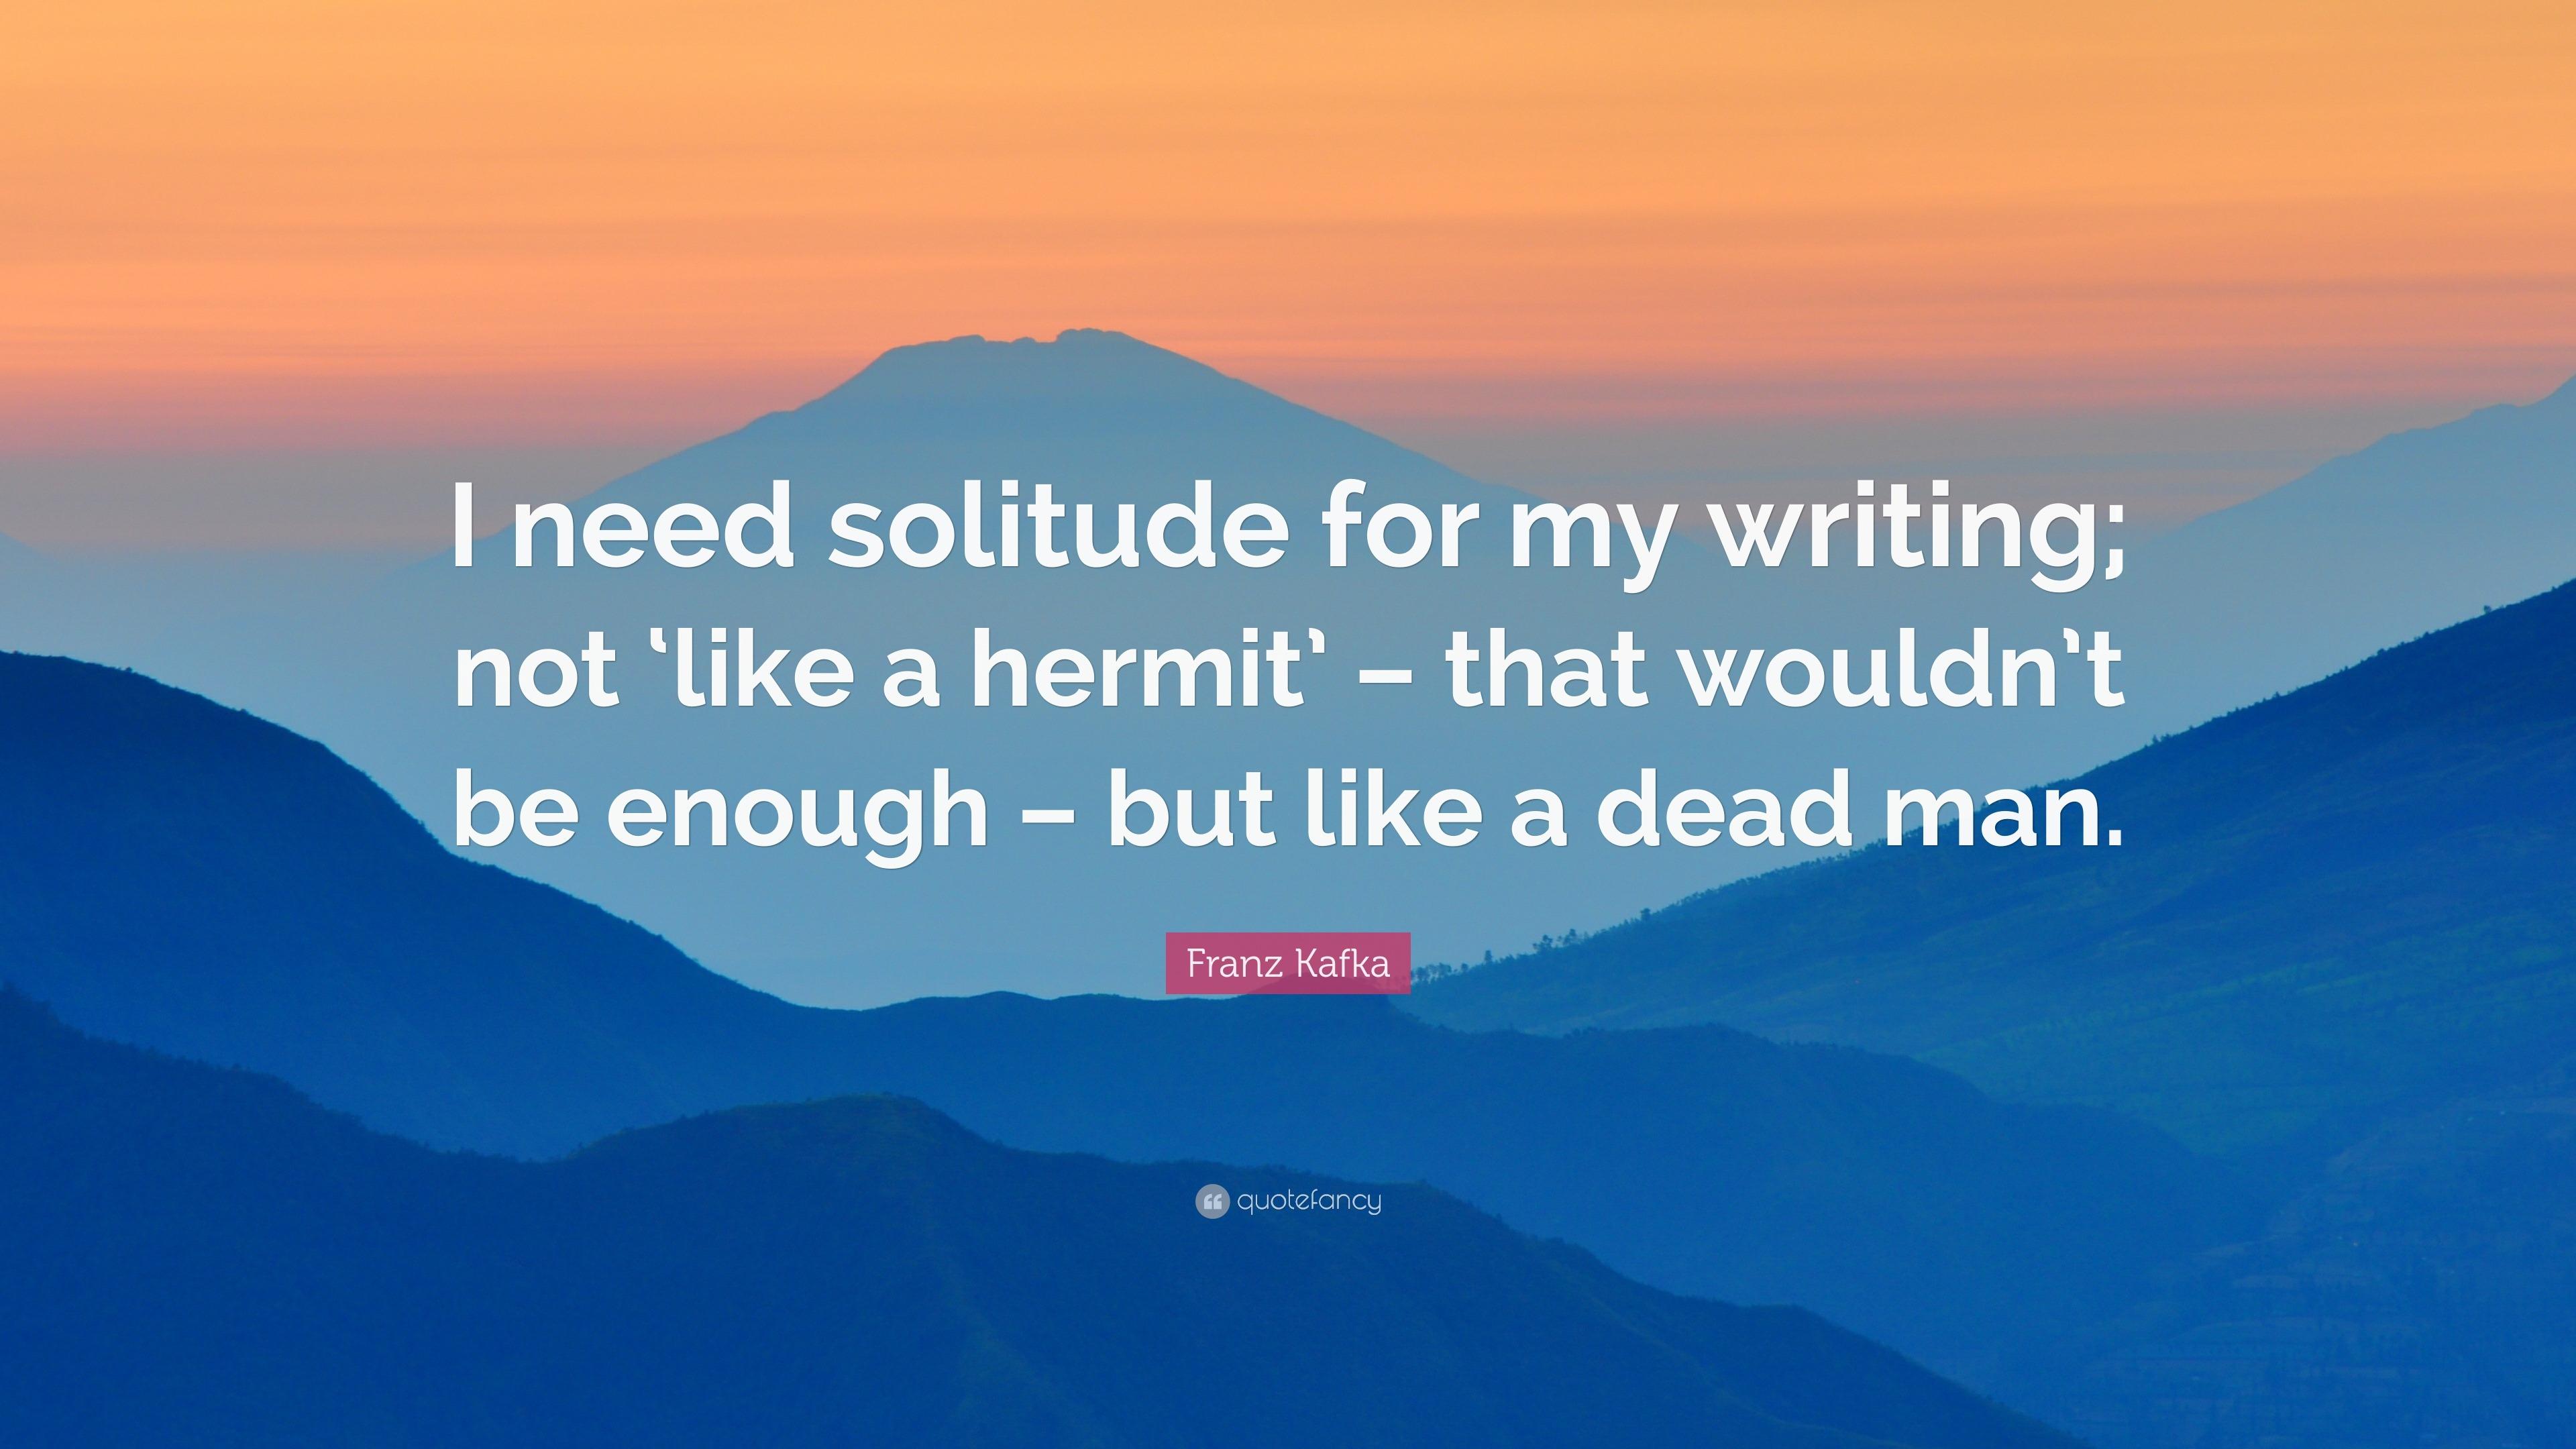 Who's a good writer??? I need help!?